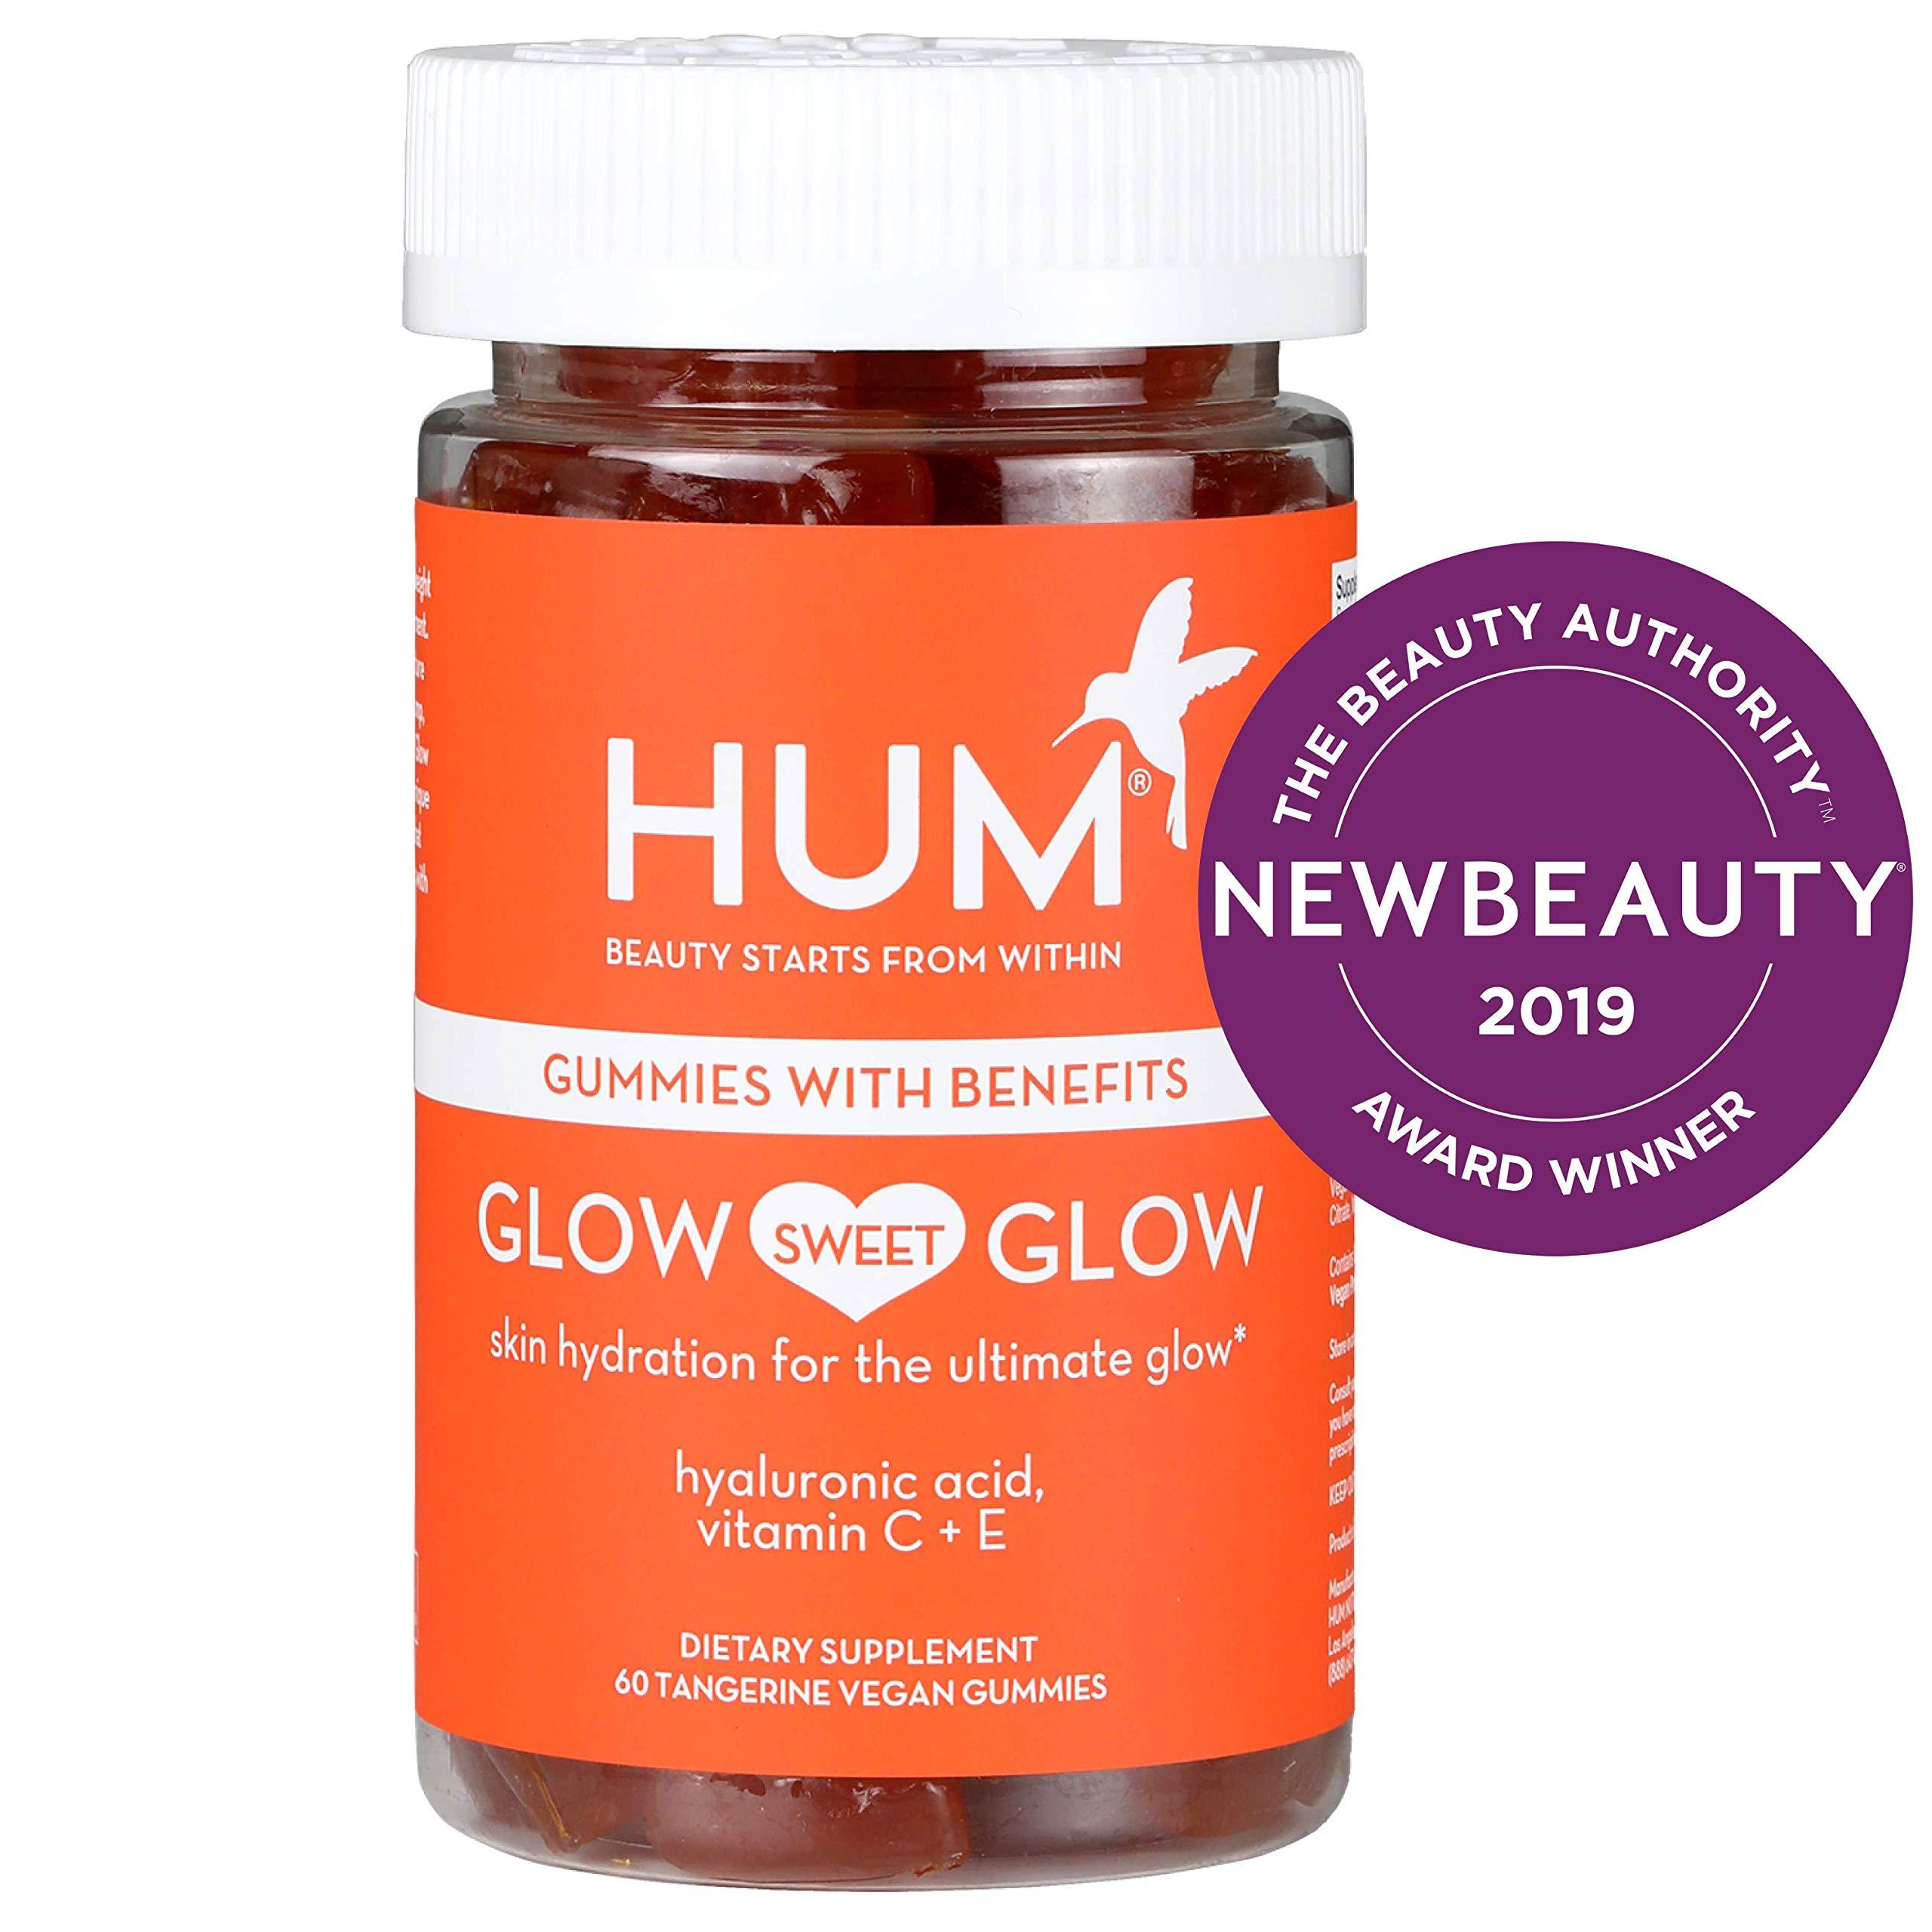 HUM Glow Sweet Glow - Vegan Skin Hydration Gummy Hearts with Hyaluronic Acid (60 Tangerine Flavored Gummies) by HUM